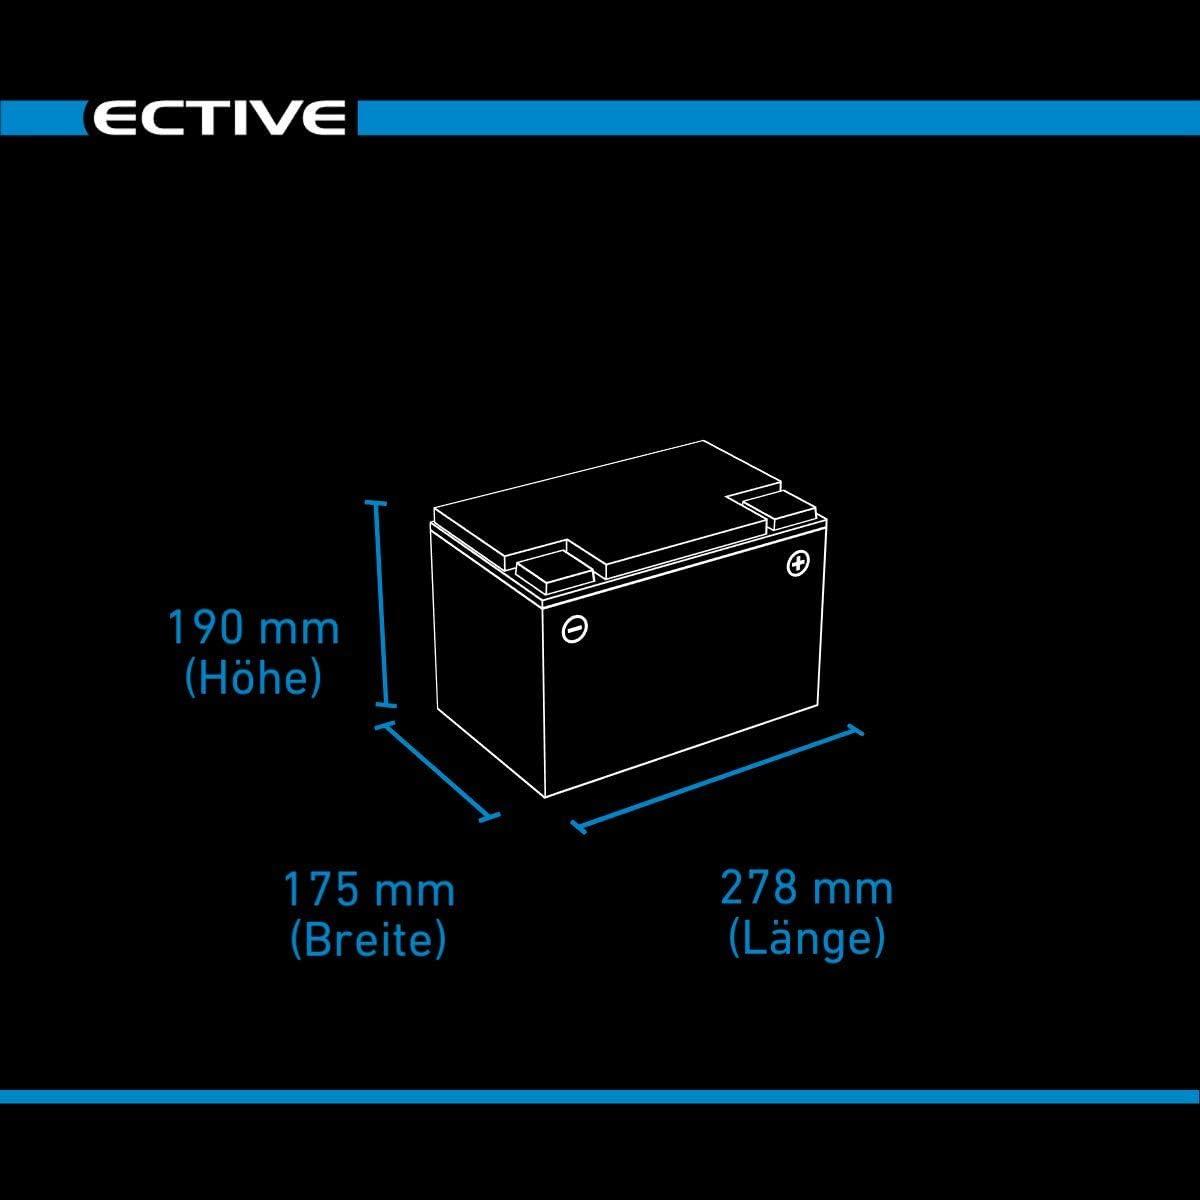 ECTIVE 12V 80Ah zyklenfester AGM Blei-Akku Versorgungsbatterie VRLA Starterbatterie Semi Cycle SC80 wartungsfrei